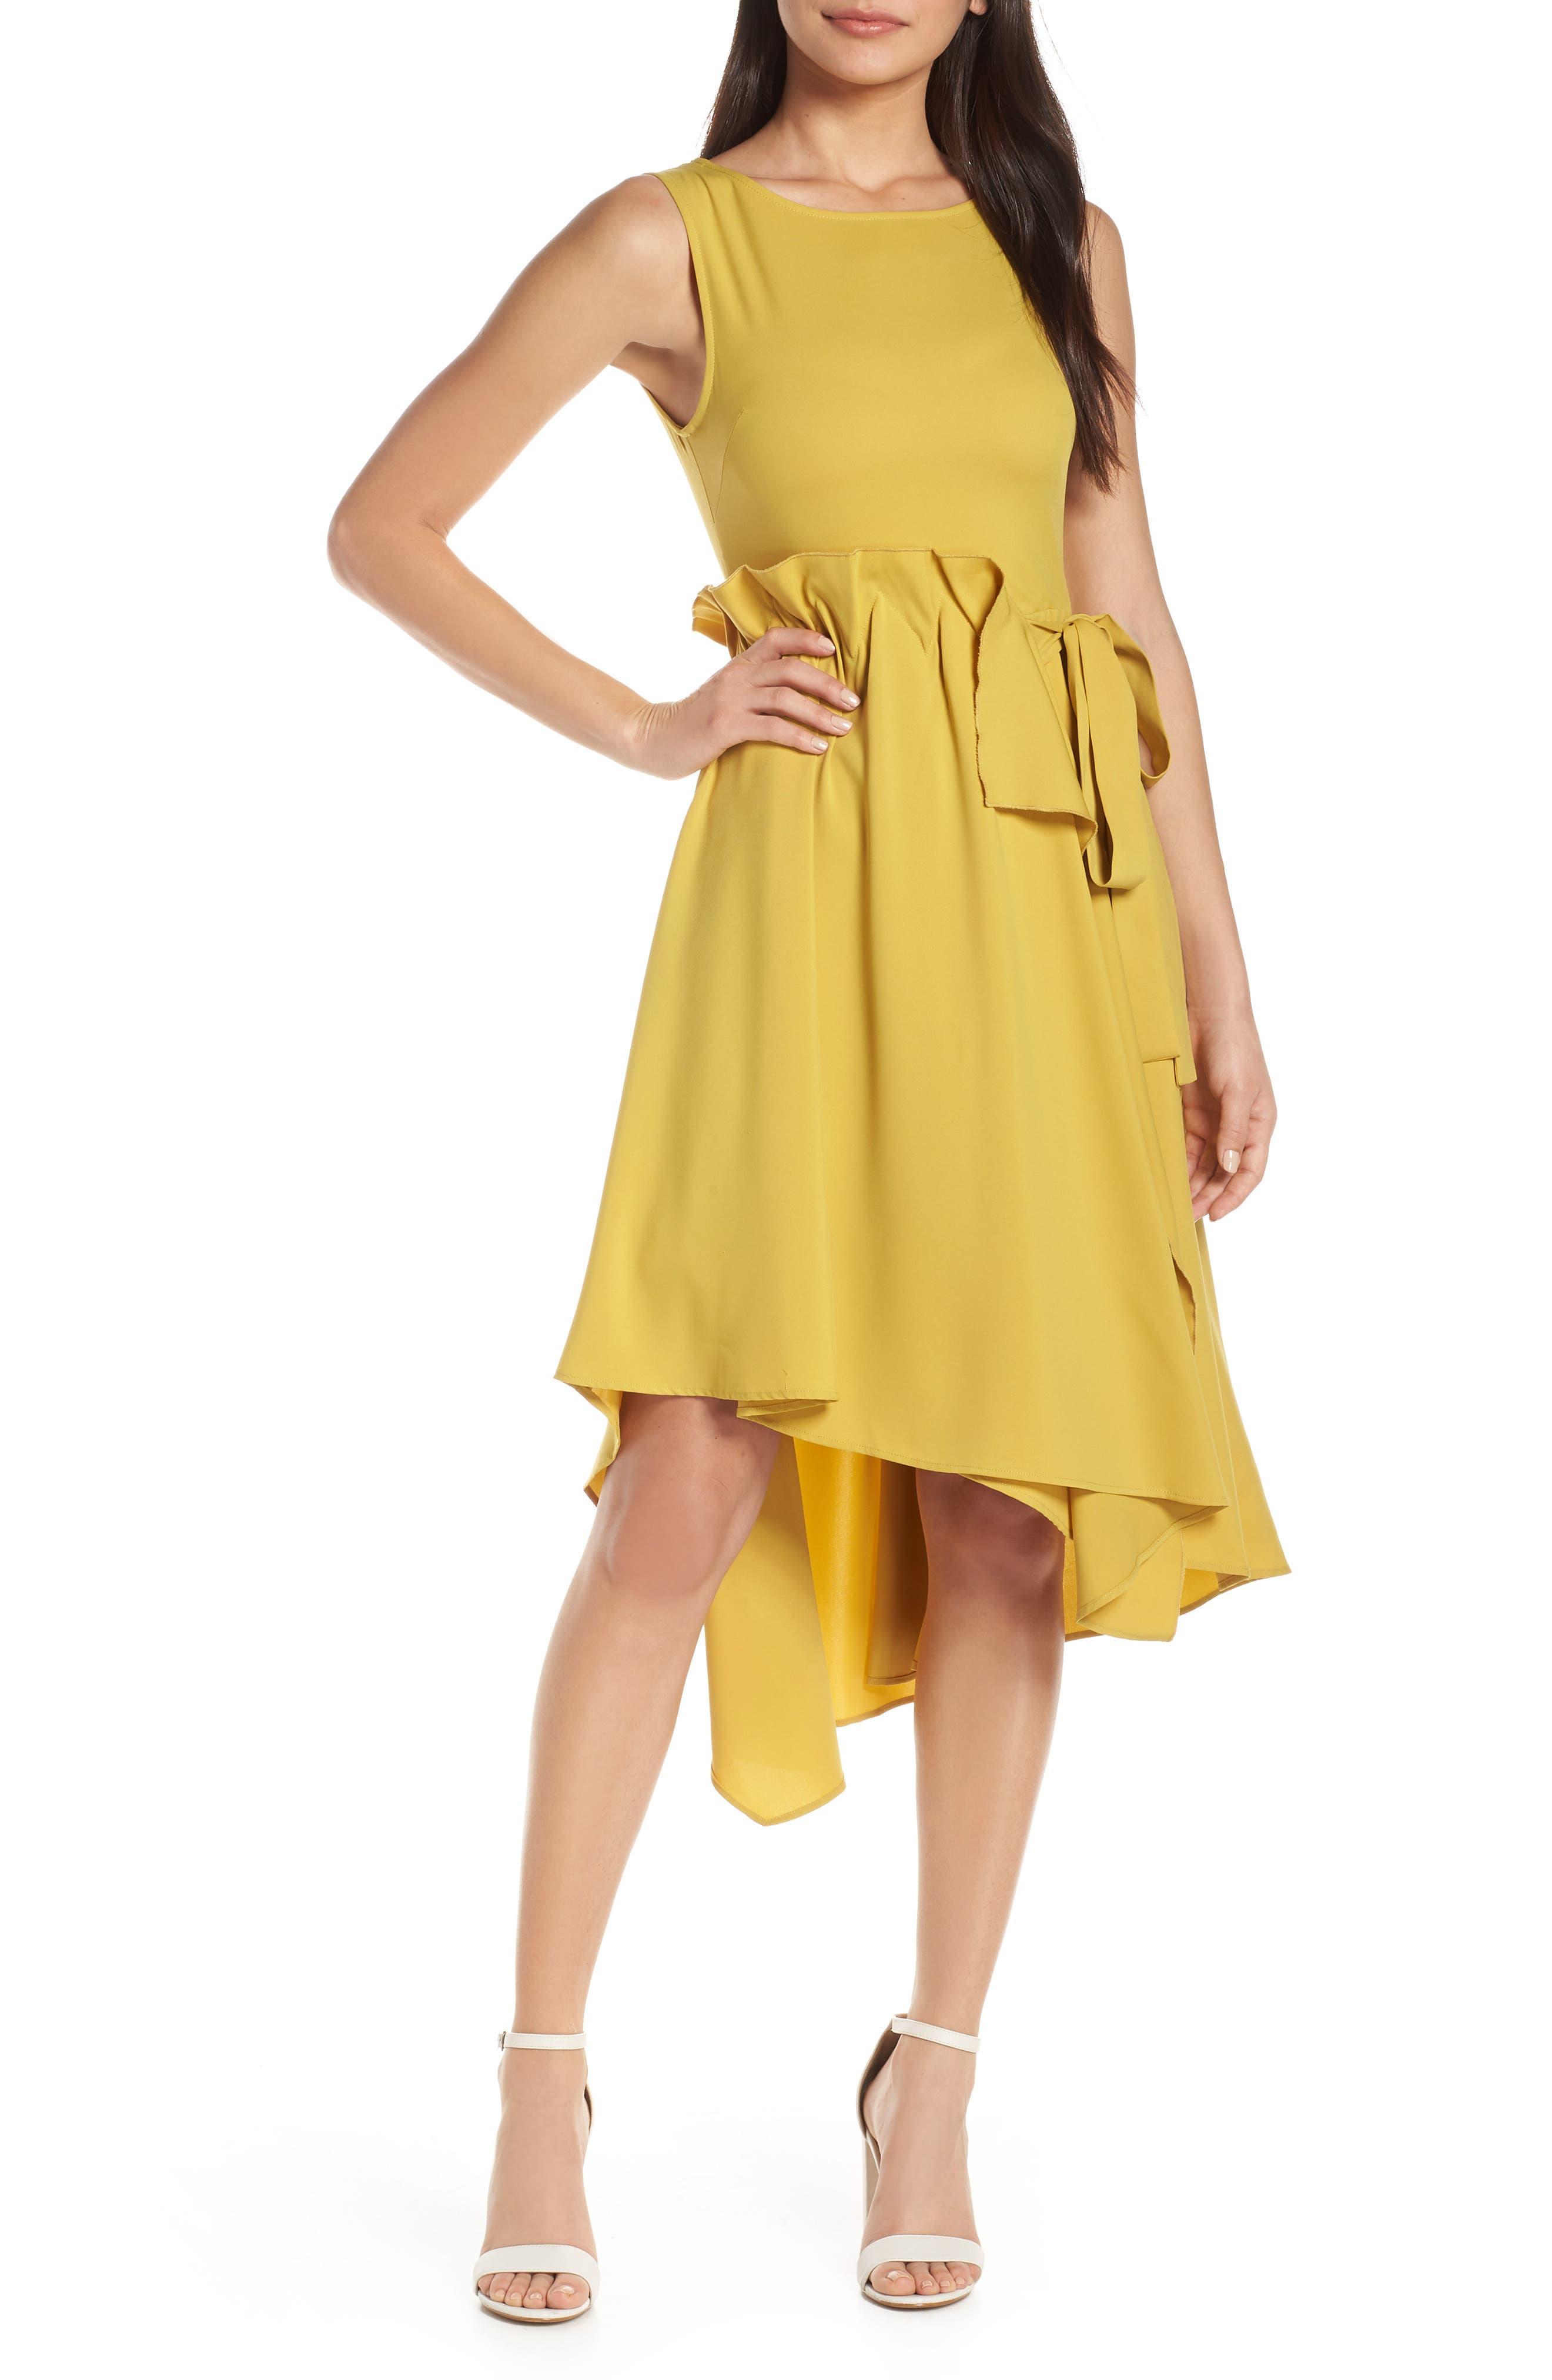 Caara Asymmetrical High/low Dress, Yellow